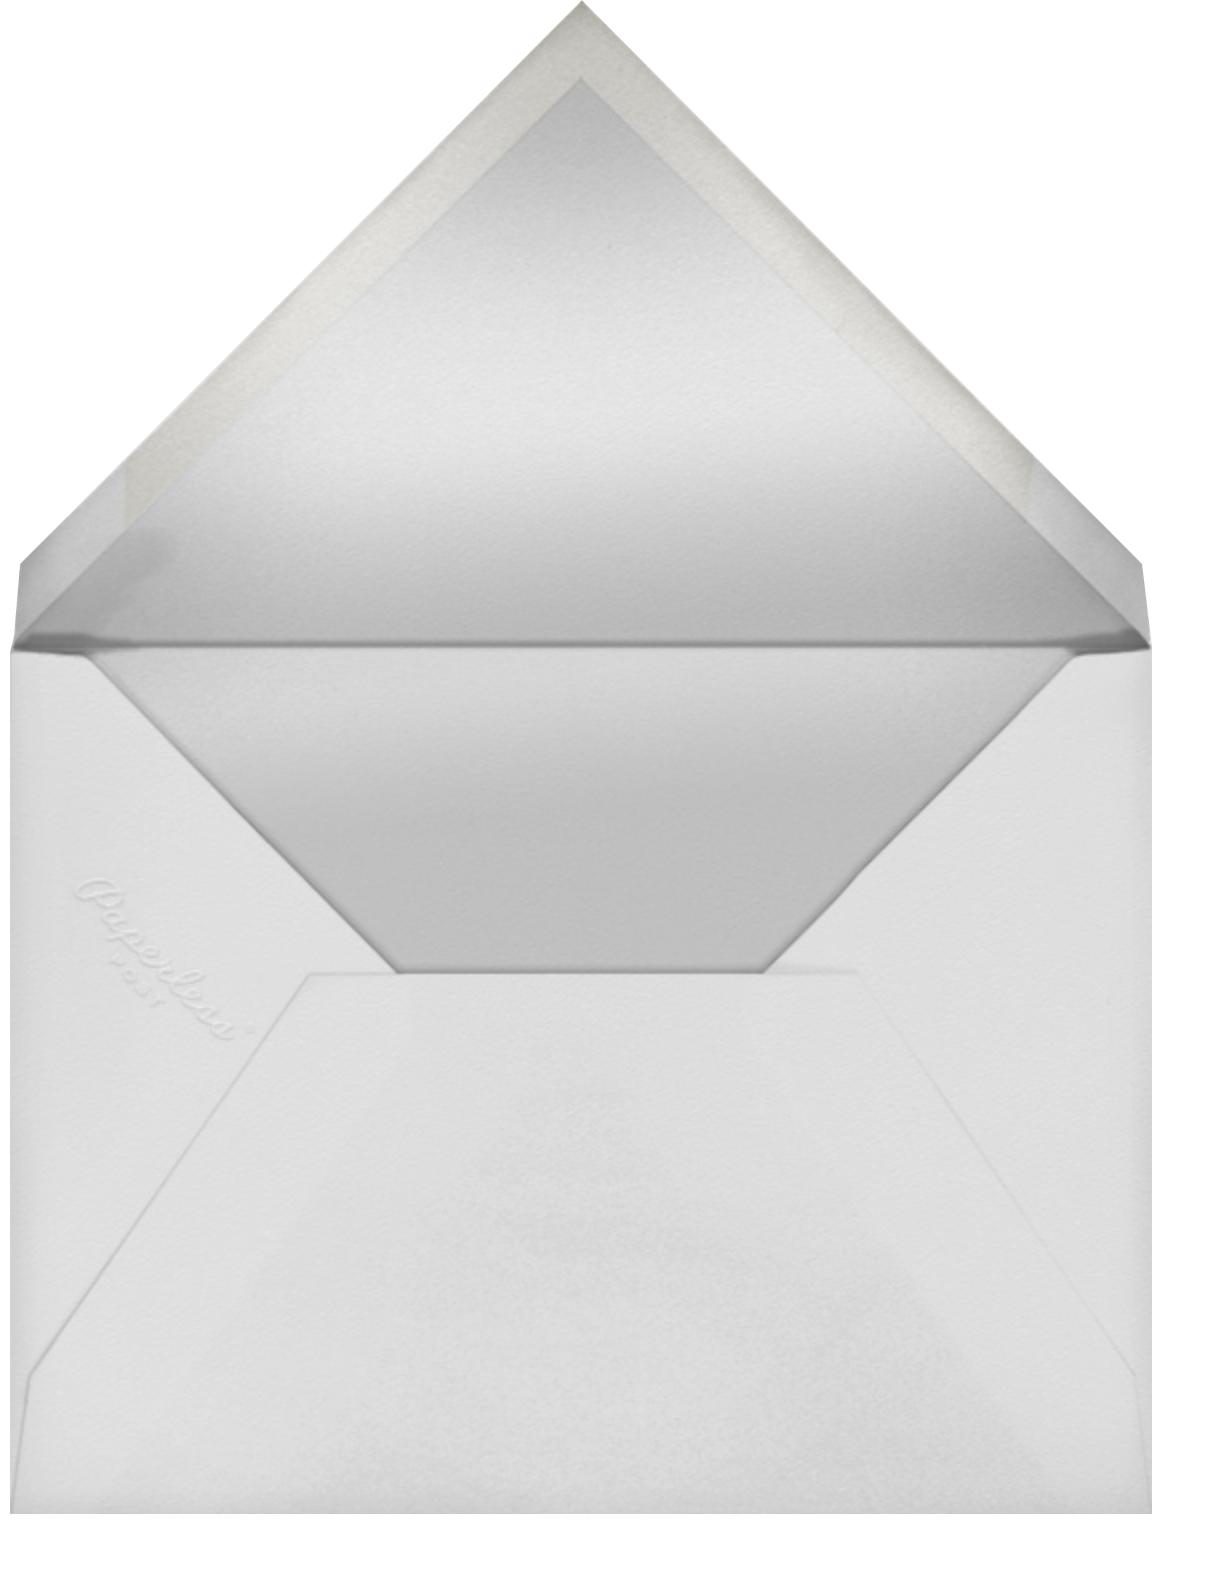 Cadogan (Leaf Green) - Paperless Post - Birthday - envelope back